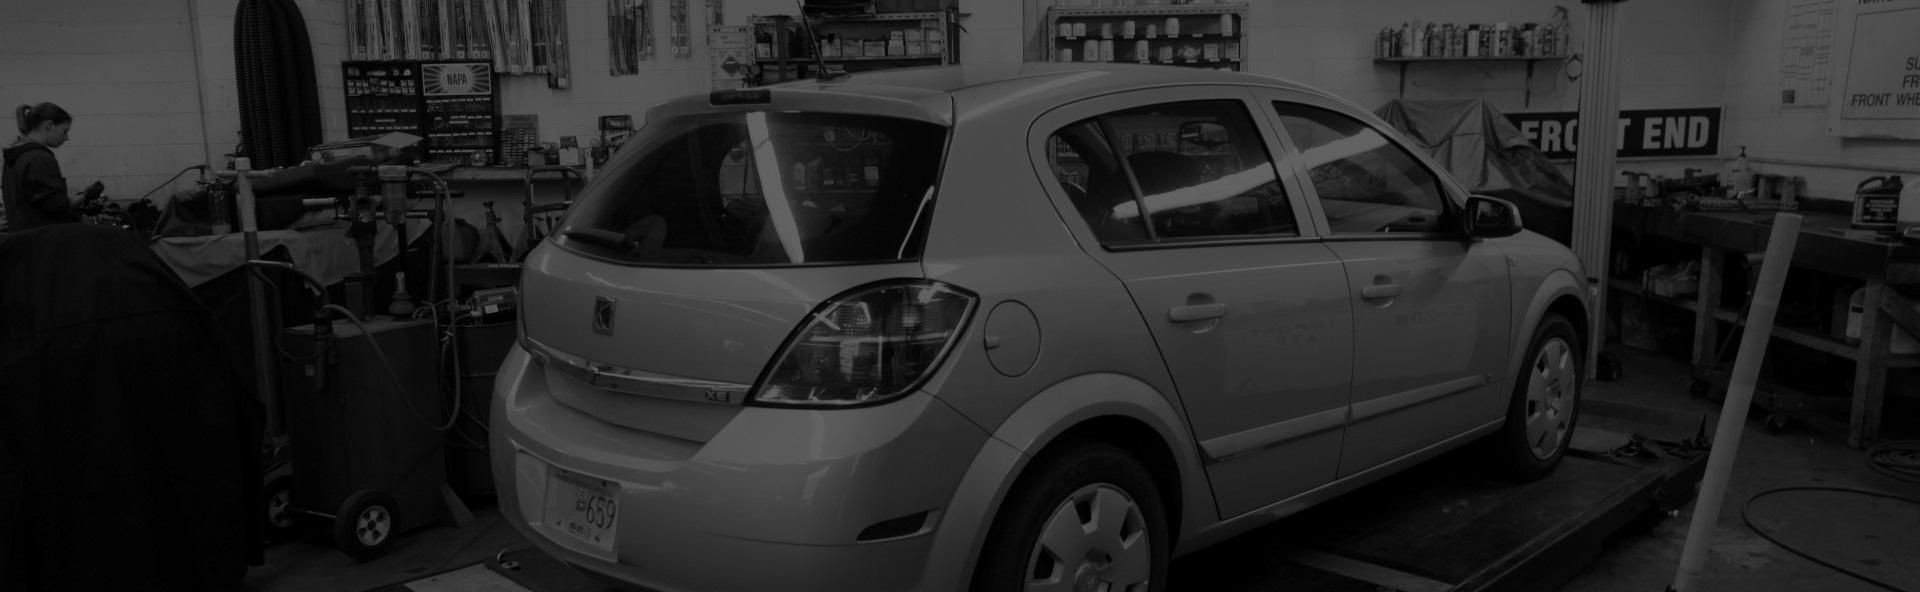 Searles Auto Repair Victoria BC - Peace of Mind Warranty